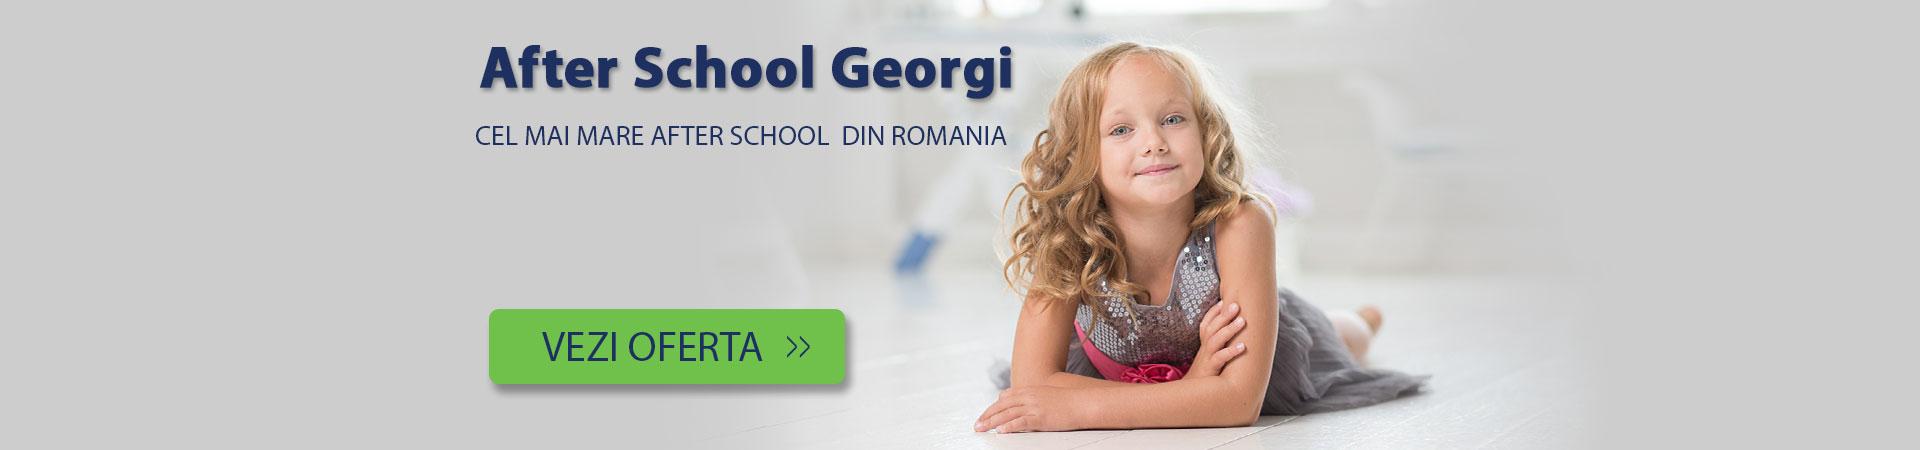 Afterschoolgeorgi-banner1